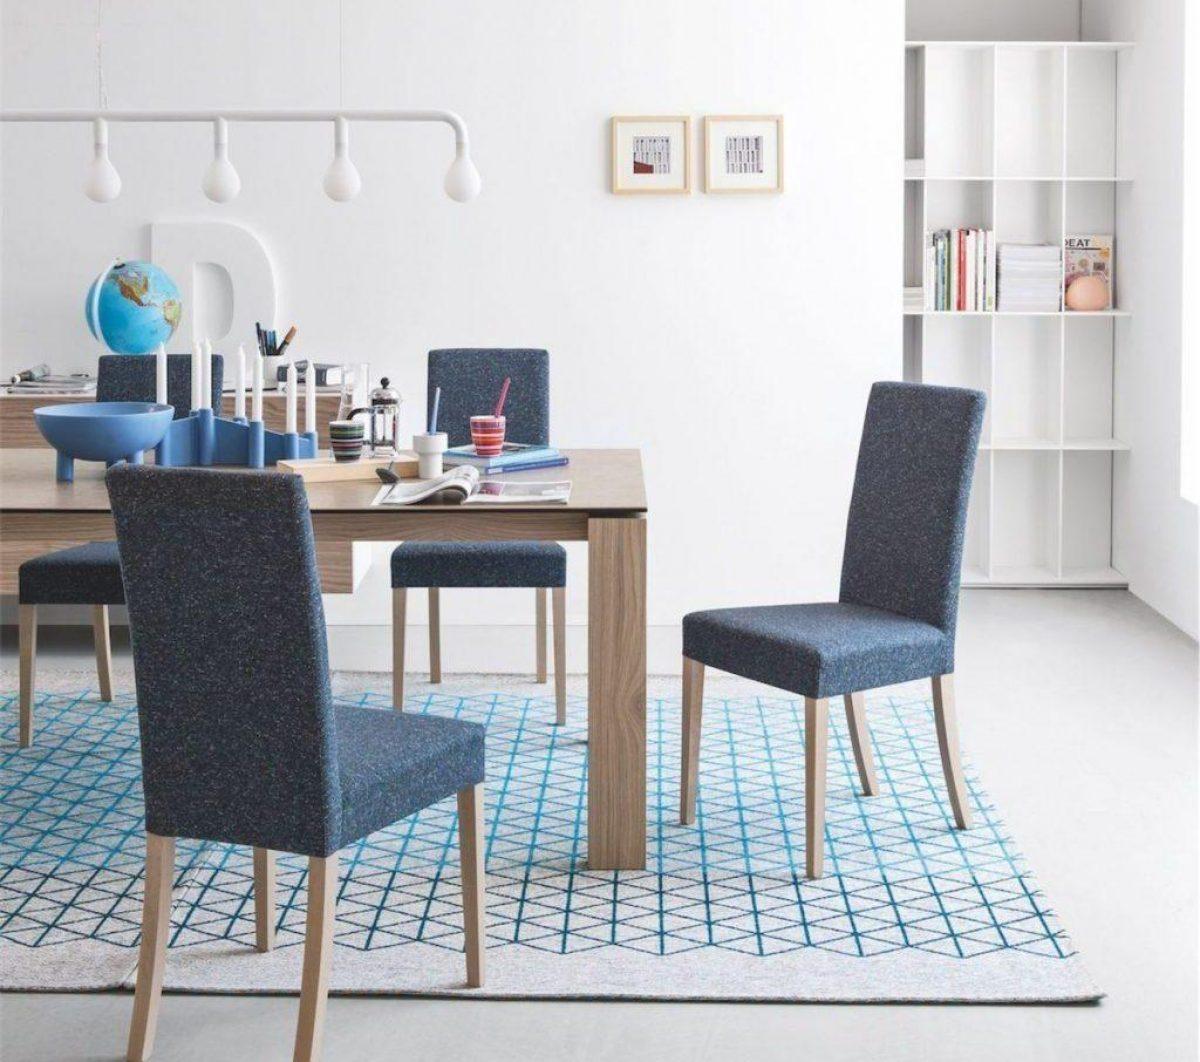 Cado modern furniture apotema 7182 azzurro area rug calligaris modern interiors 1024x1185